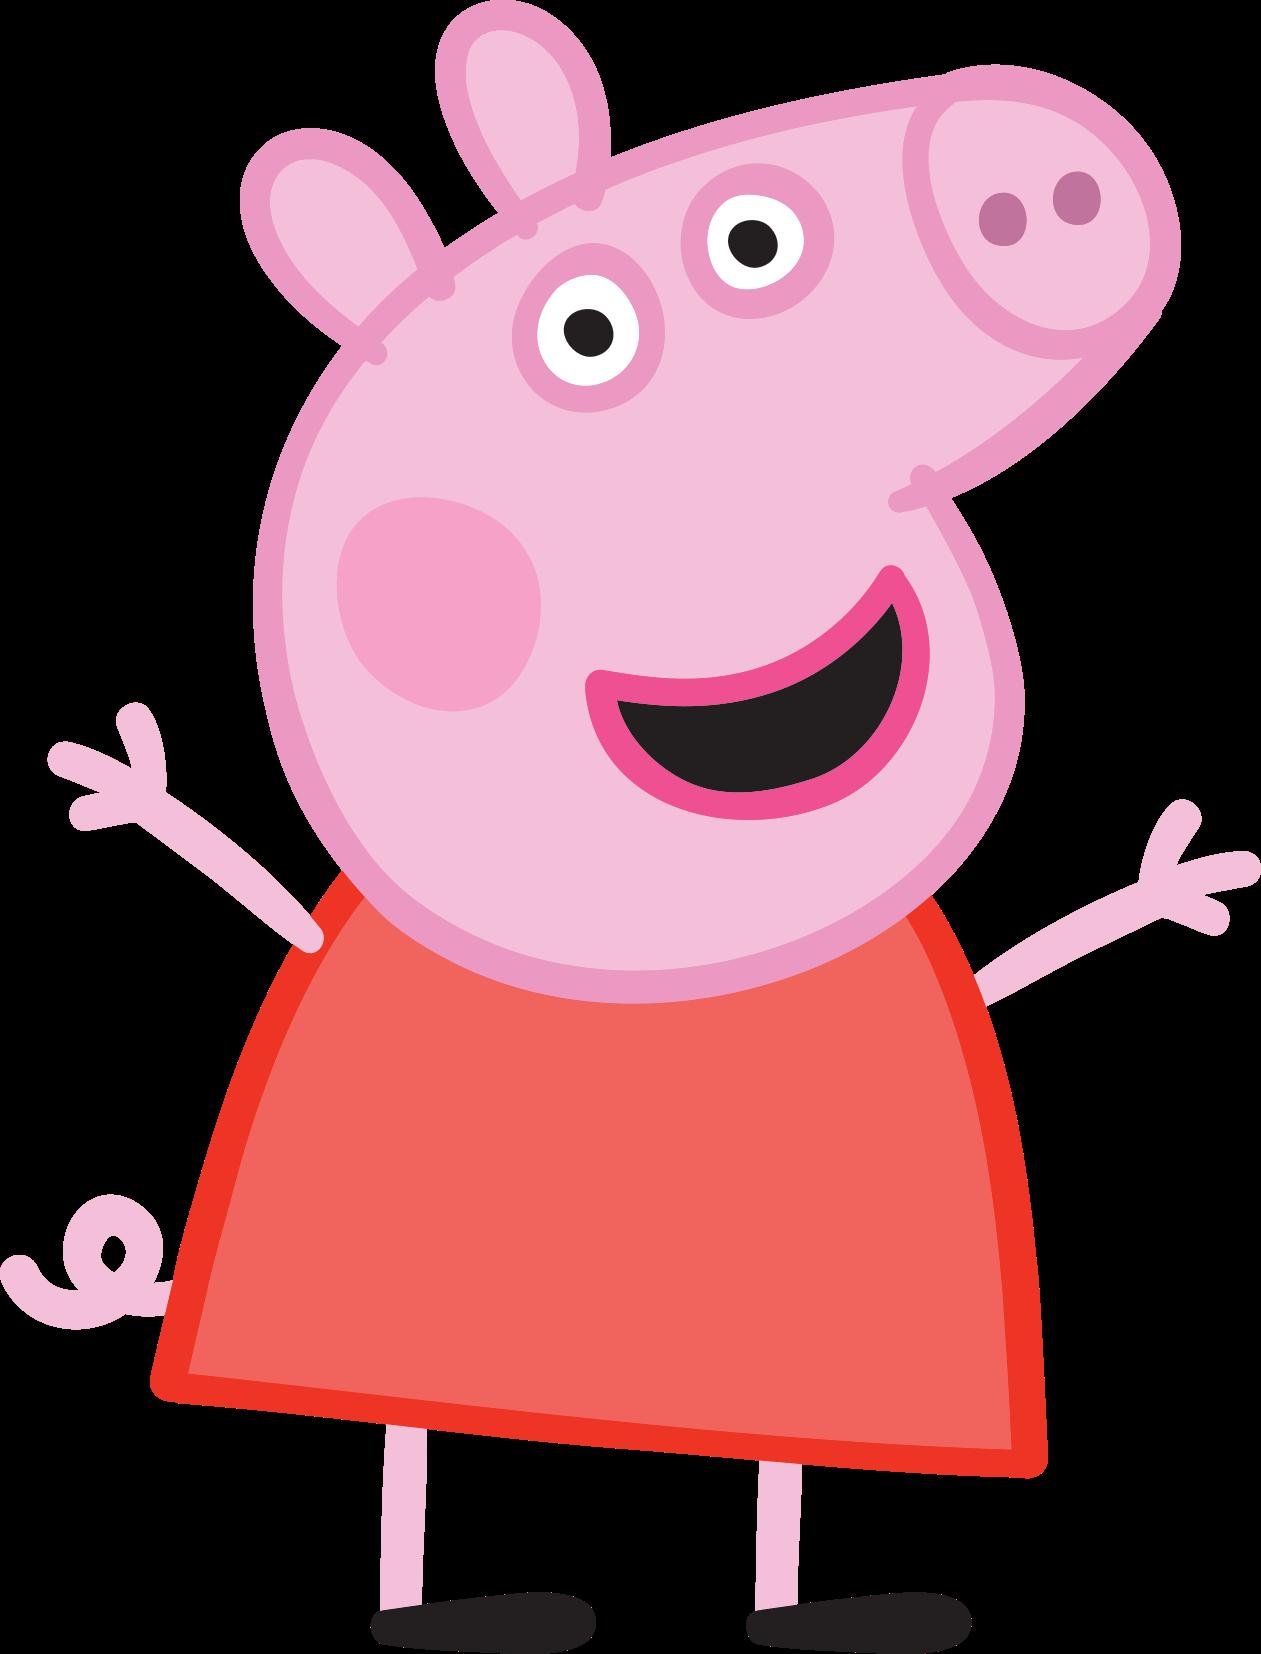 Peppa Pig Clipart.